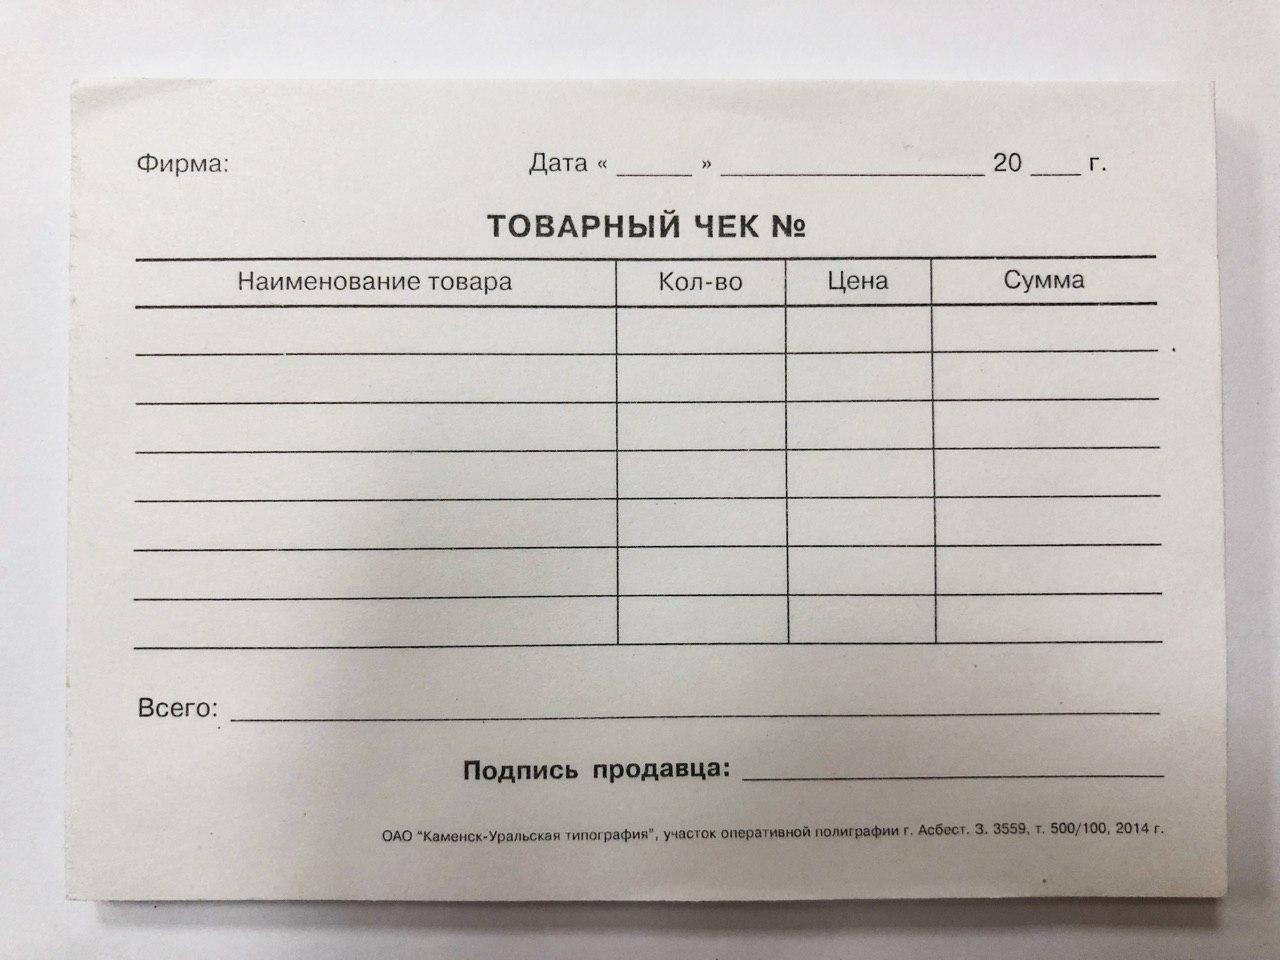 http://www.delkniga.ru/files/core/товарный%20чек%20офсет1